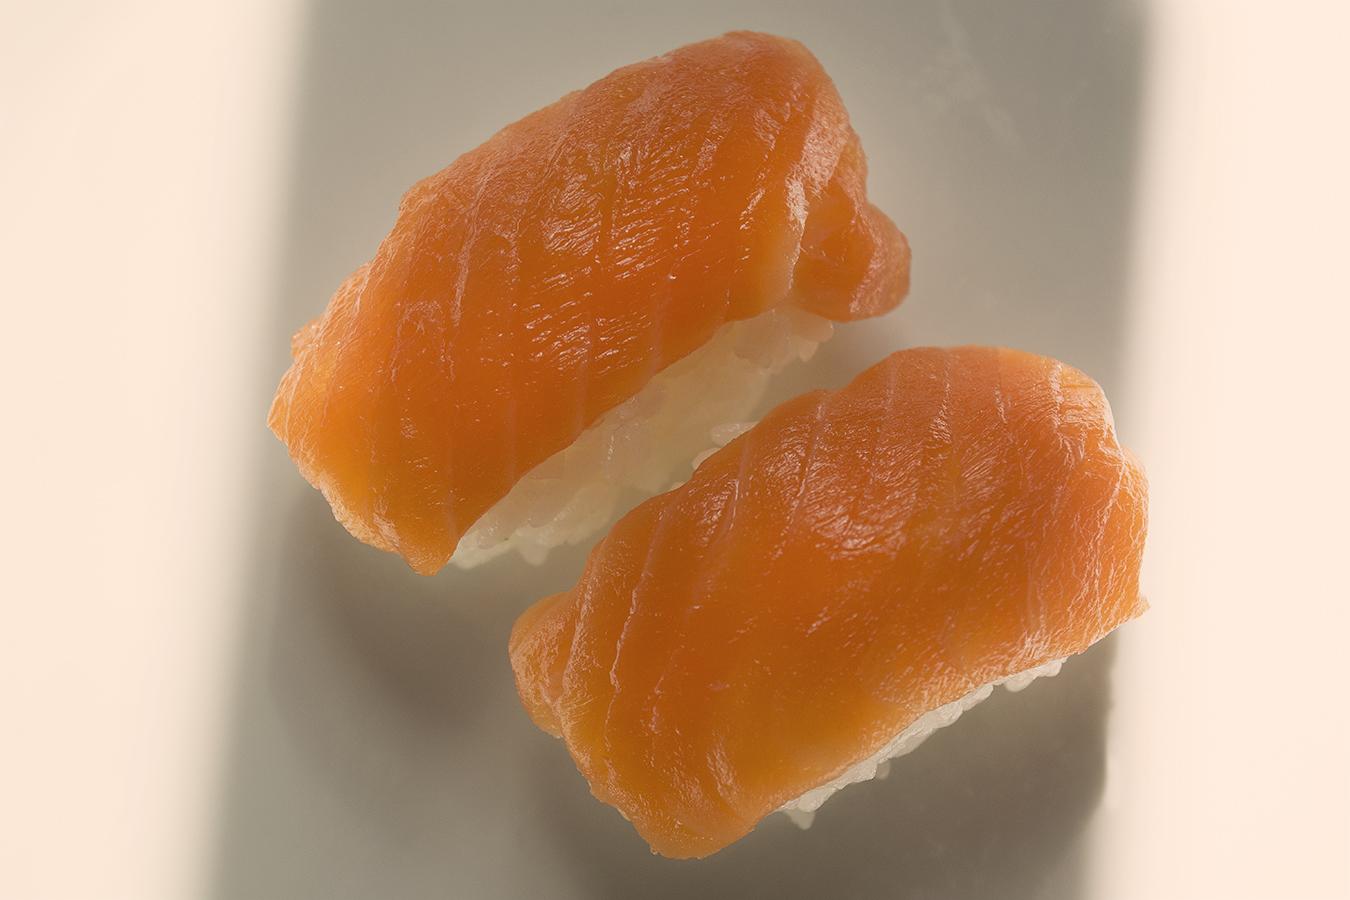 Karen_Liao_still_life_photography_sushi_orange_smooth_salmon